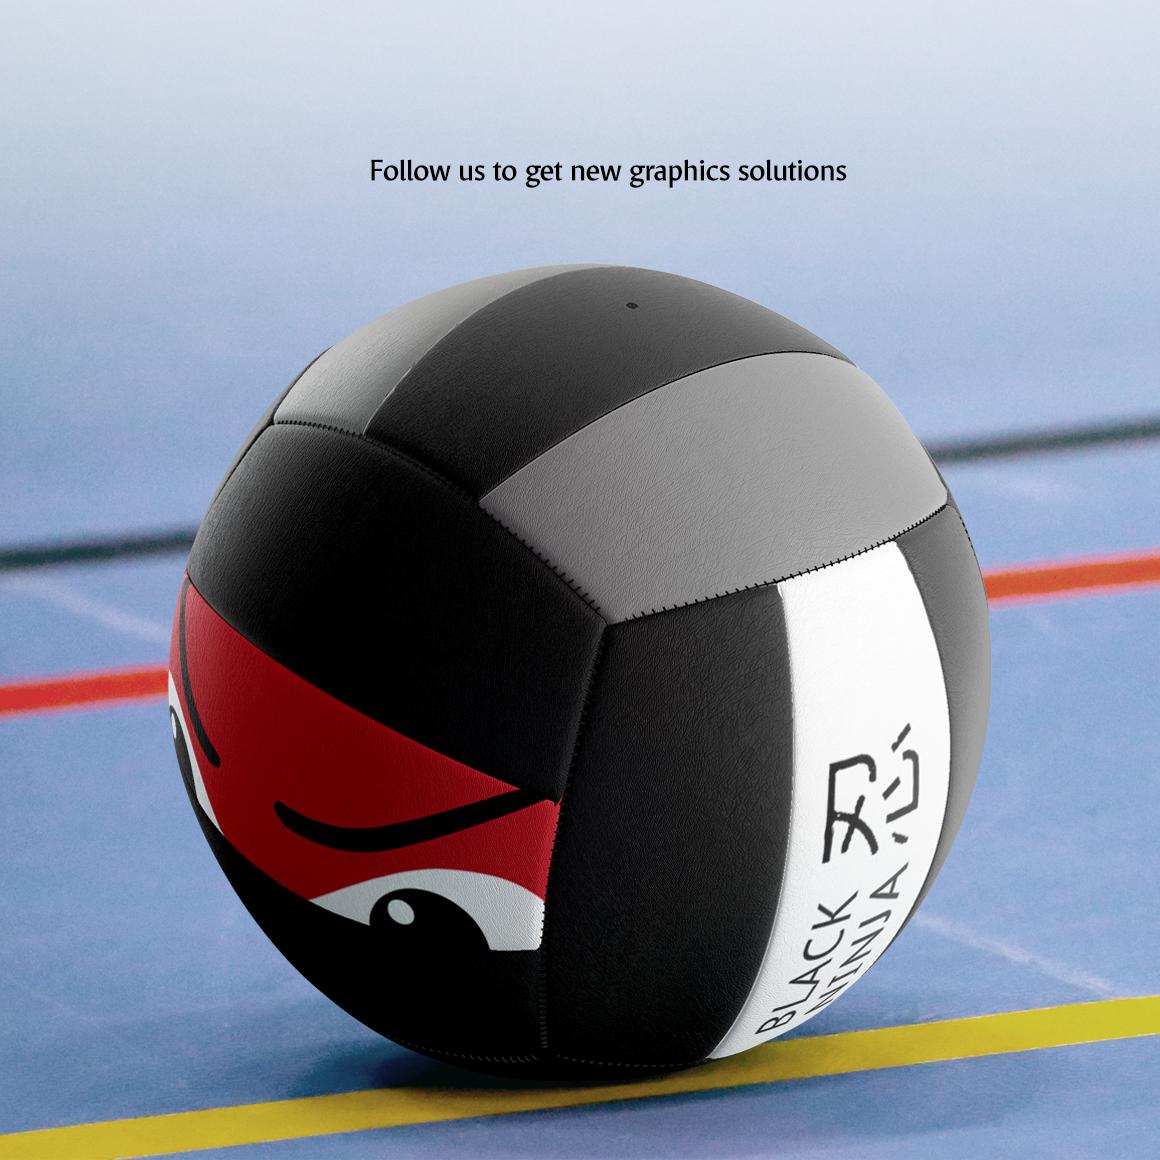 Volleyball Ball Animated Mockup example image 8